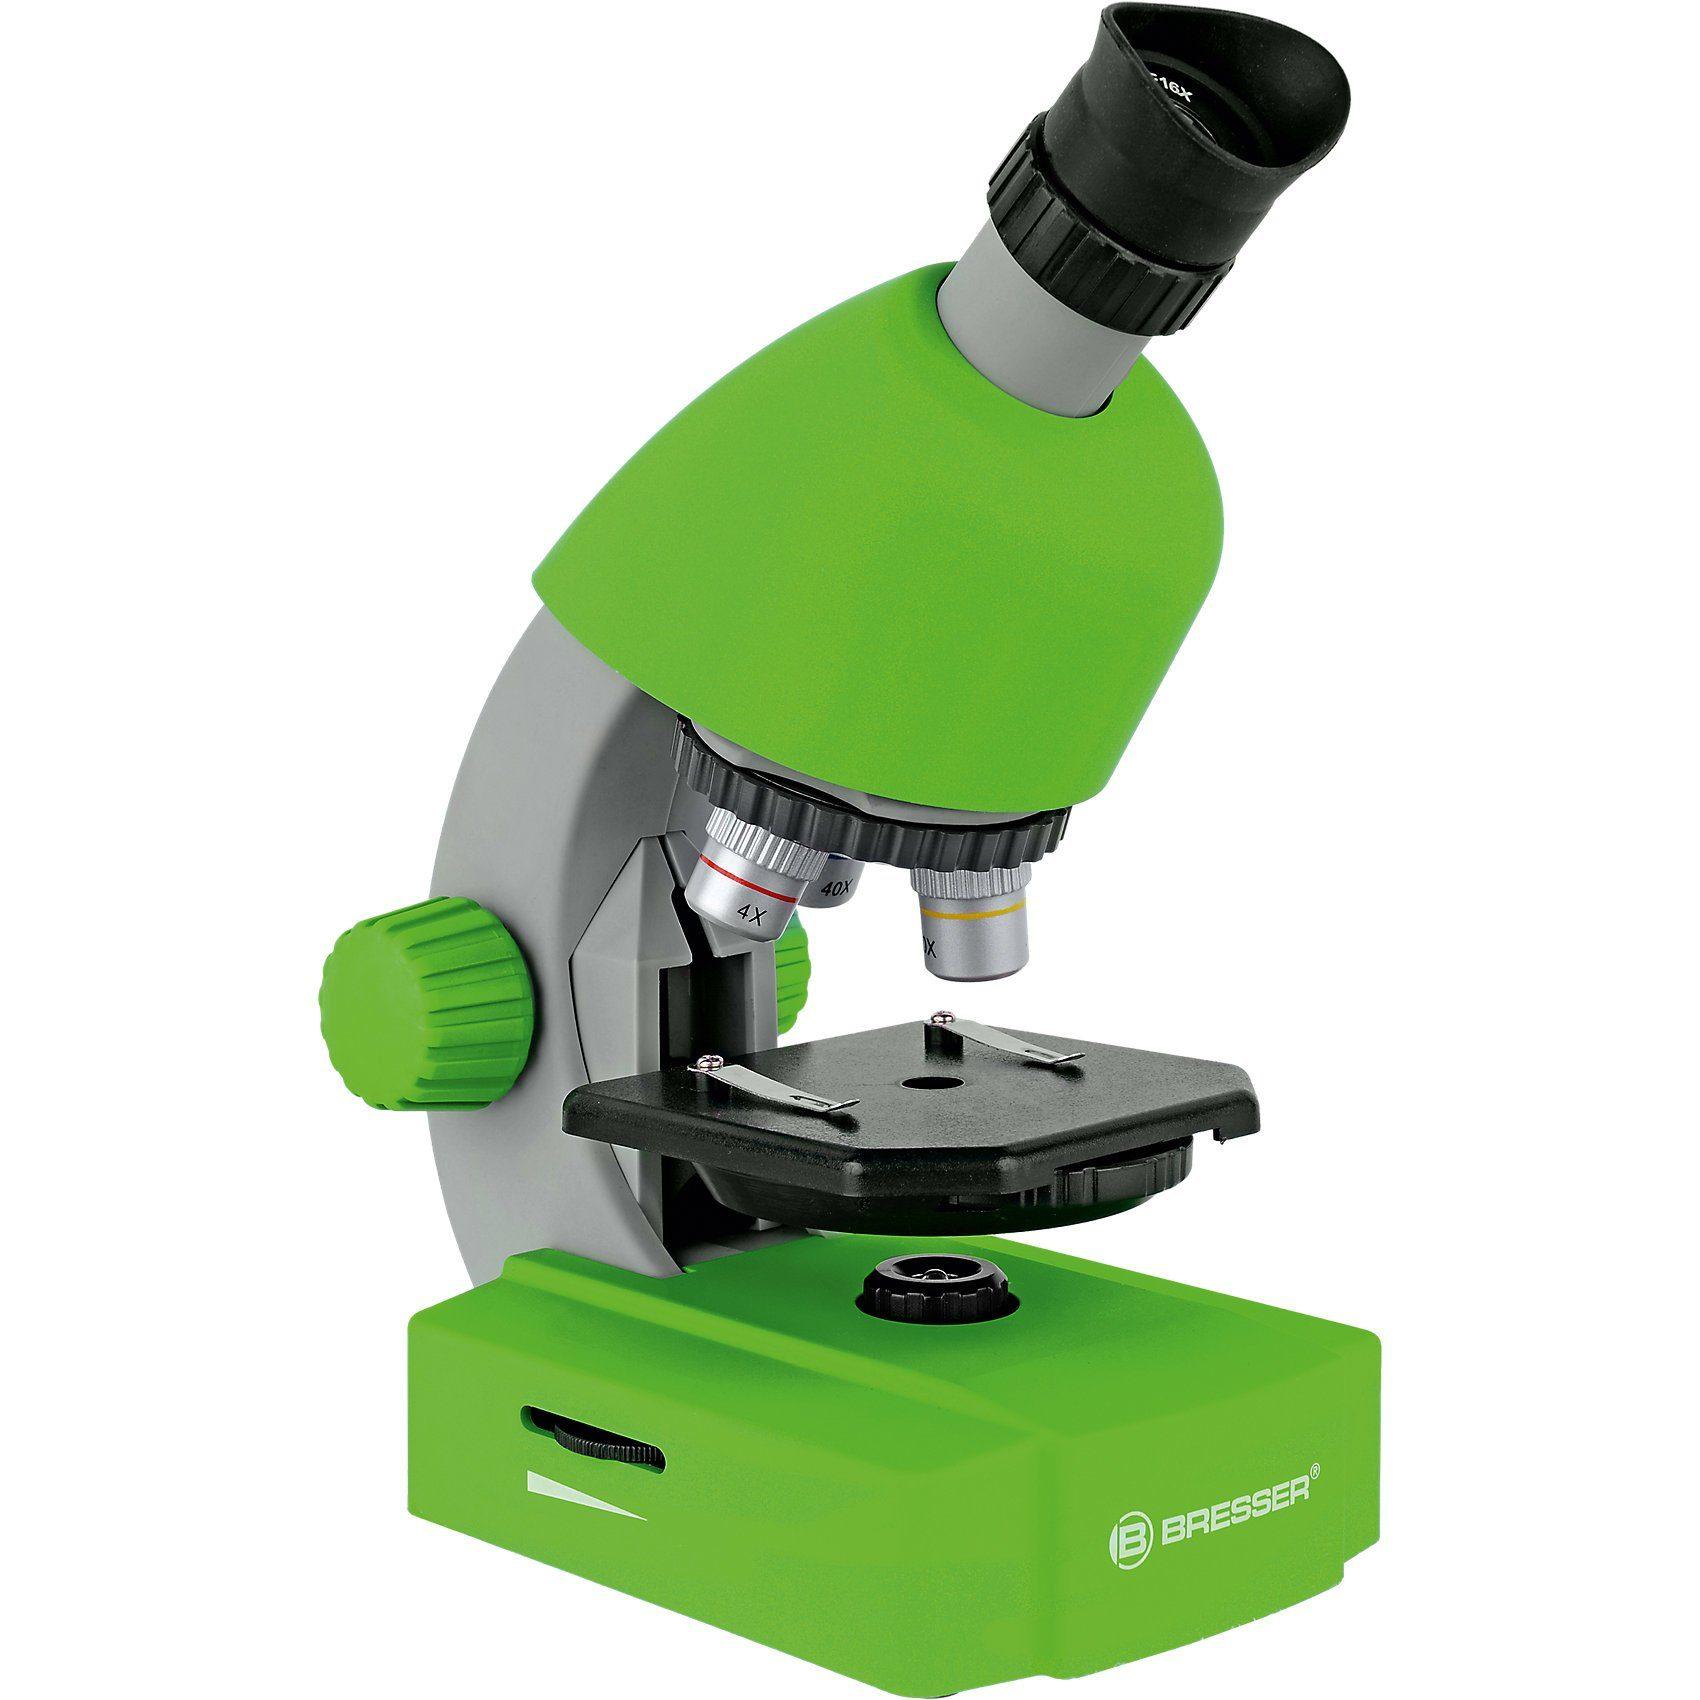 BRESSER 40x-640x Mikroskop Grün